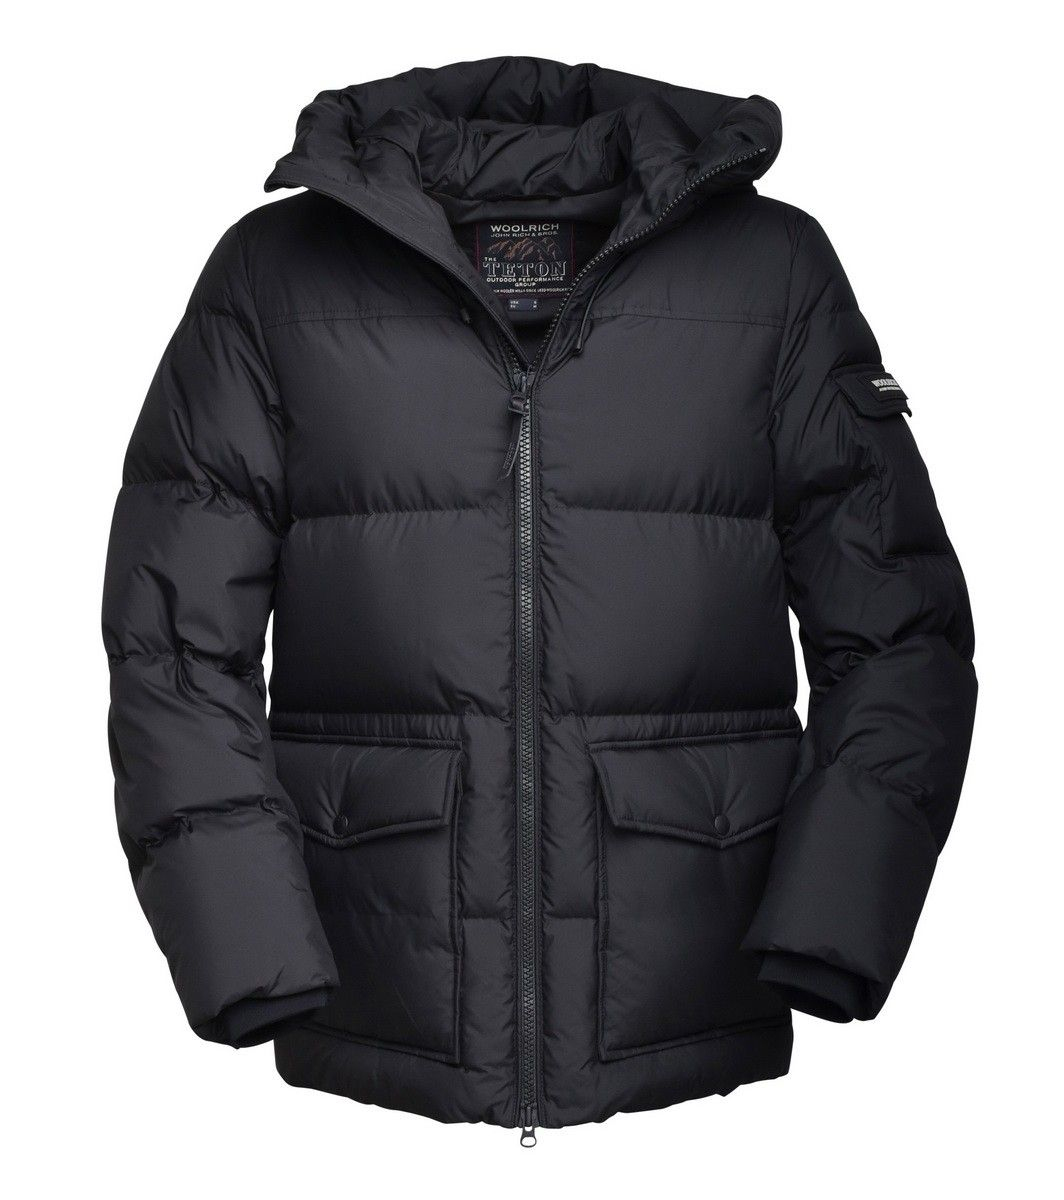 WOOLRICH - Herren Jacke - Sierra Supreme Short Jacket - Black